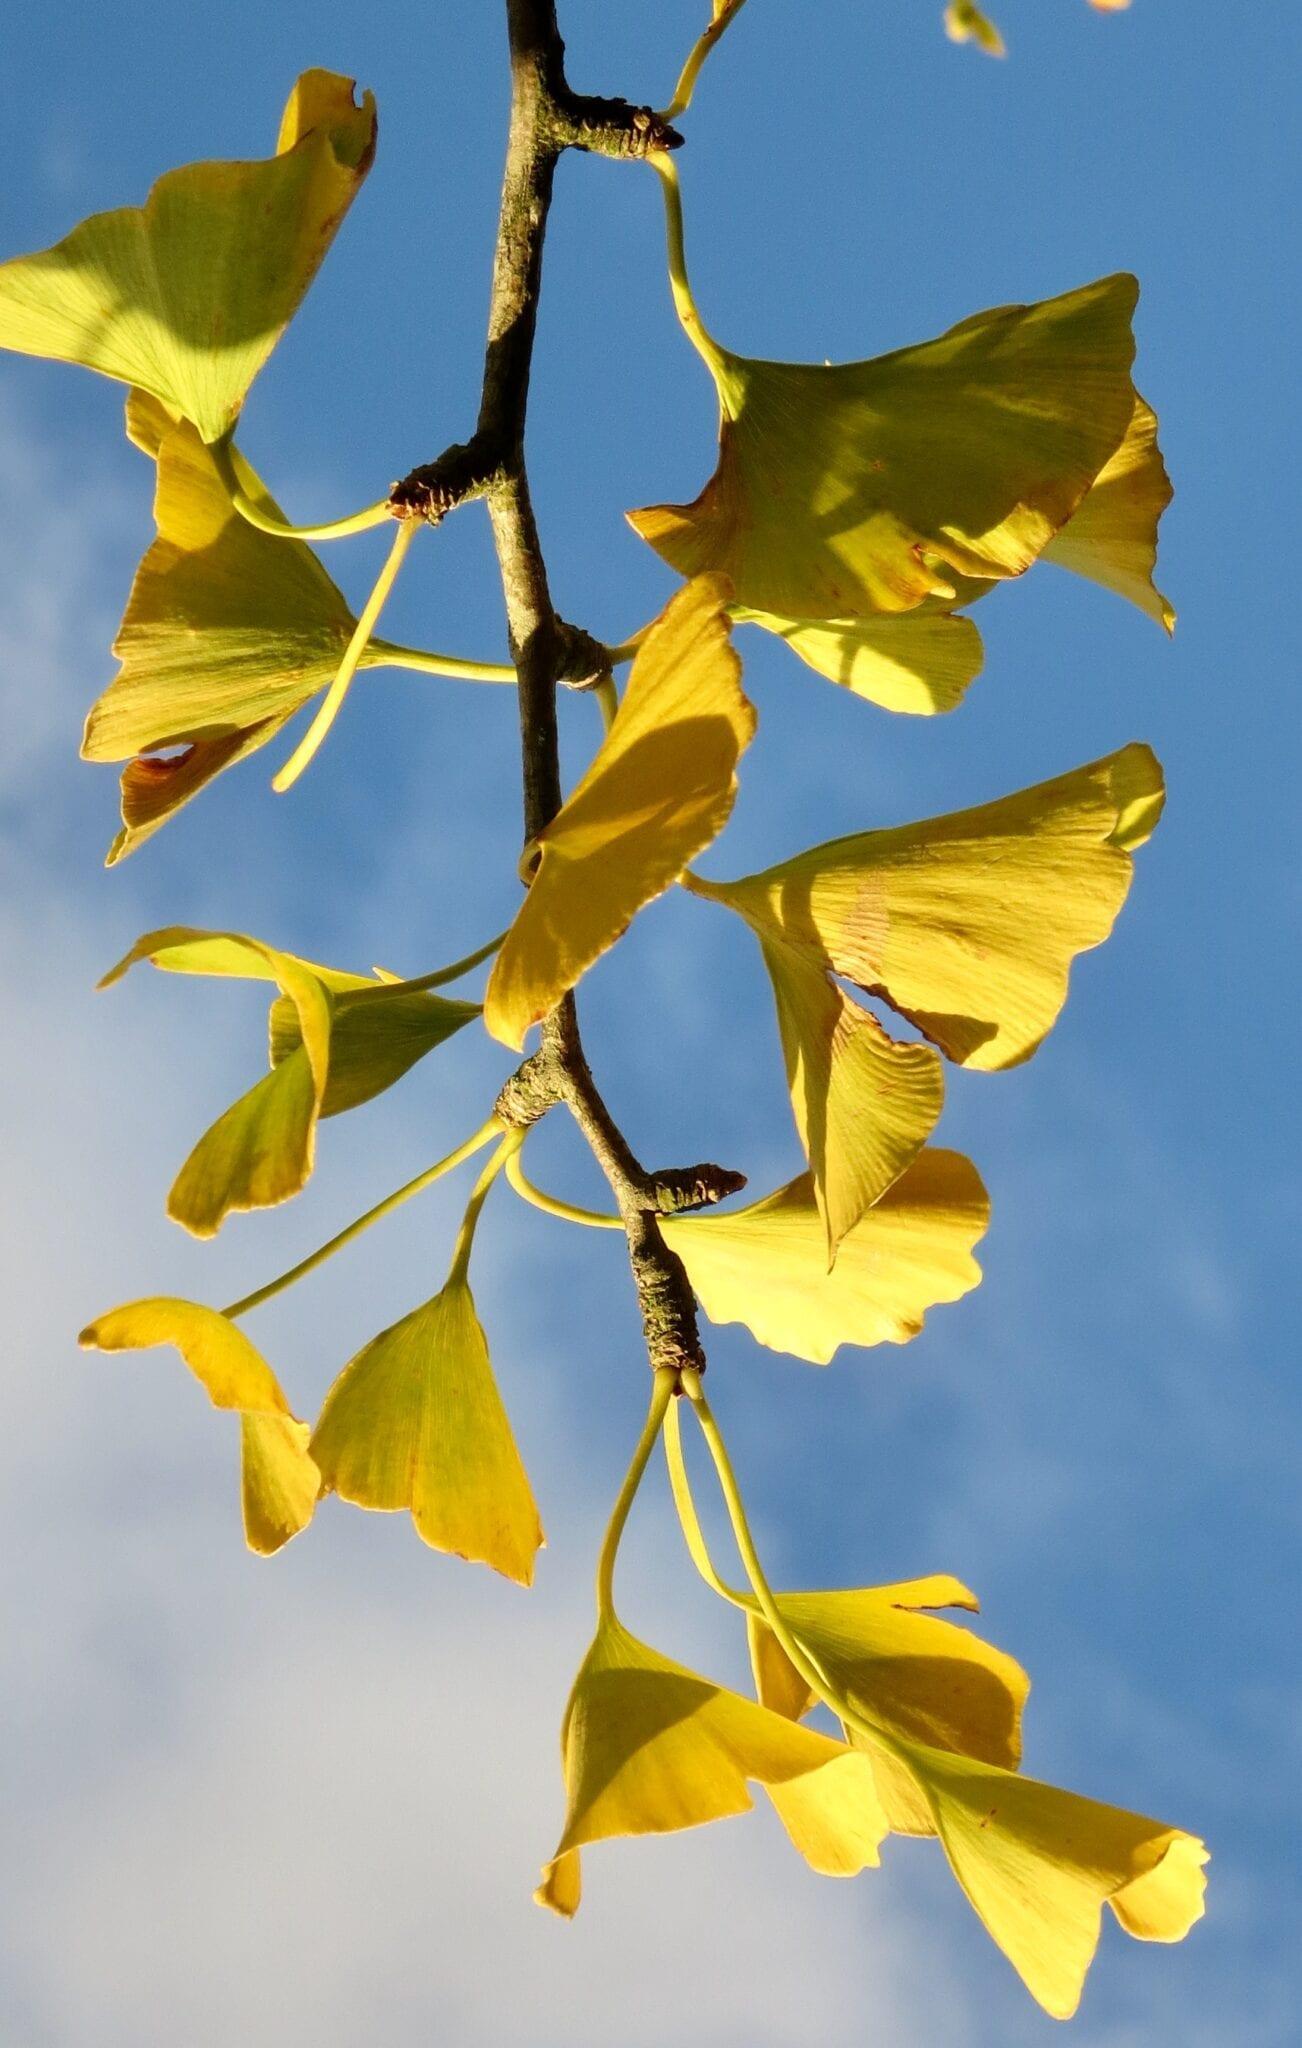 ginkgo tree leaves in autumn